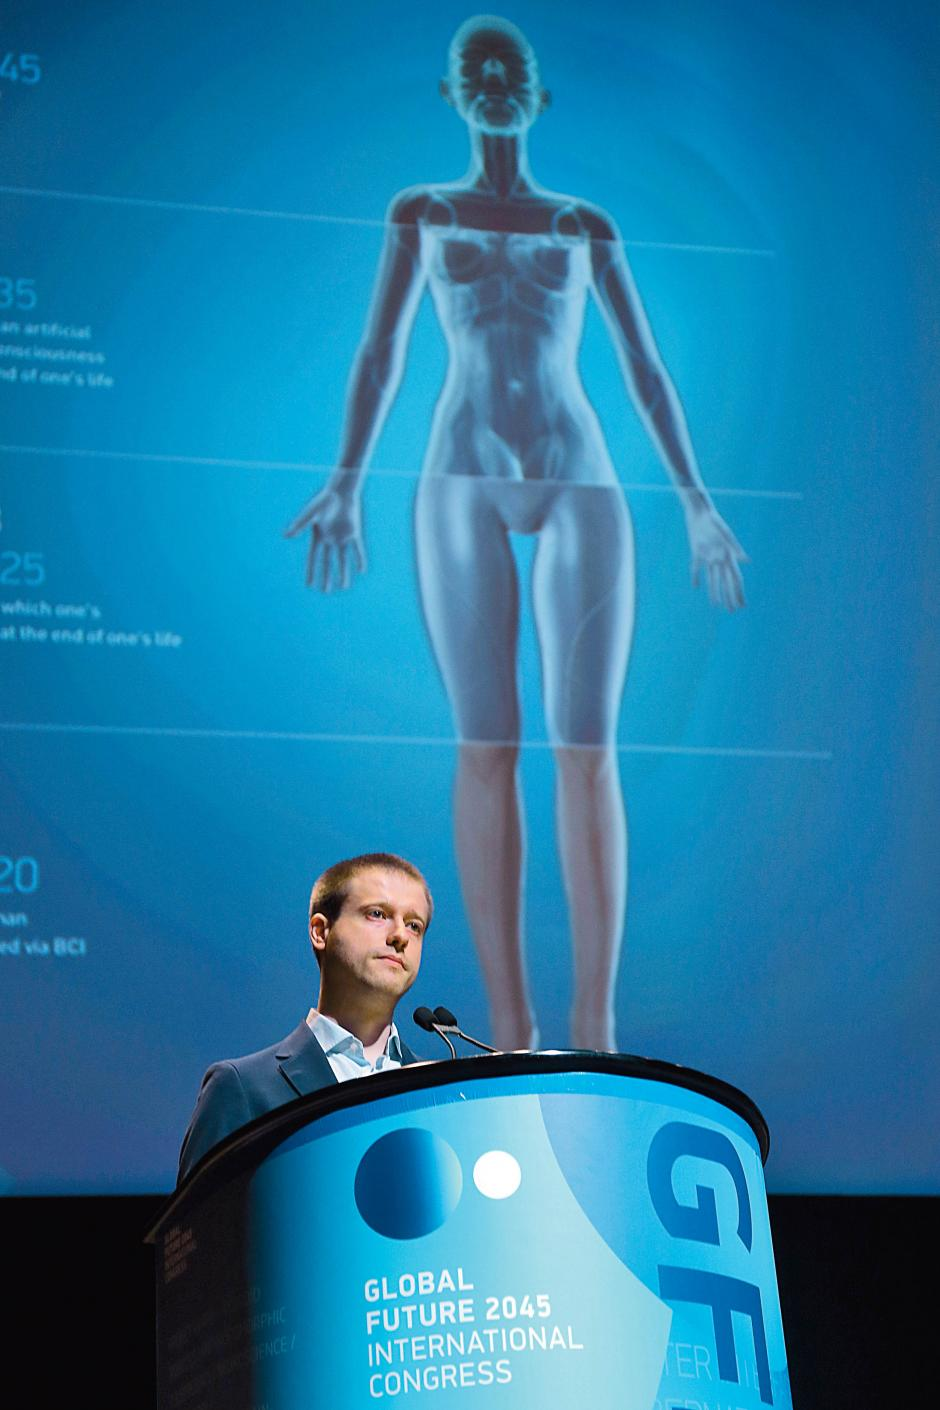 Russian billionaire Dmitry Itskov addresses the Global Future 2045 Congress, June 15, 2013 at Lincoln Center in New York. MARY ALTAFFER/AP